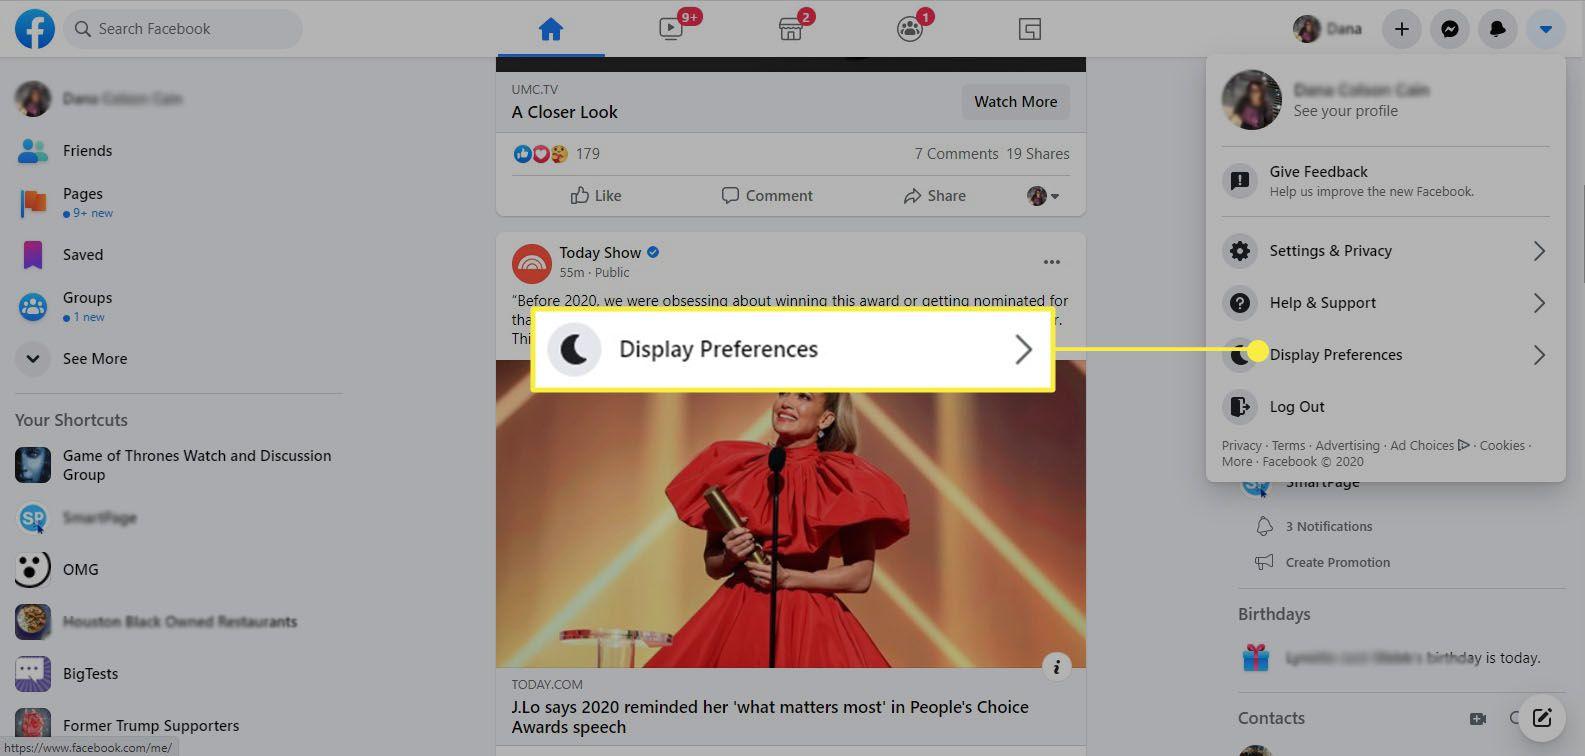 Facebook - Display Preferences